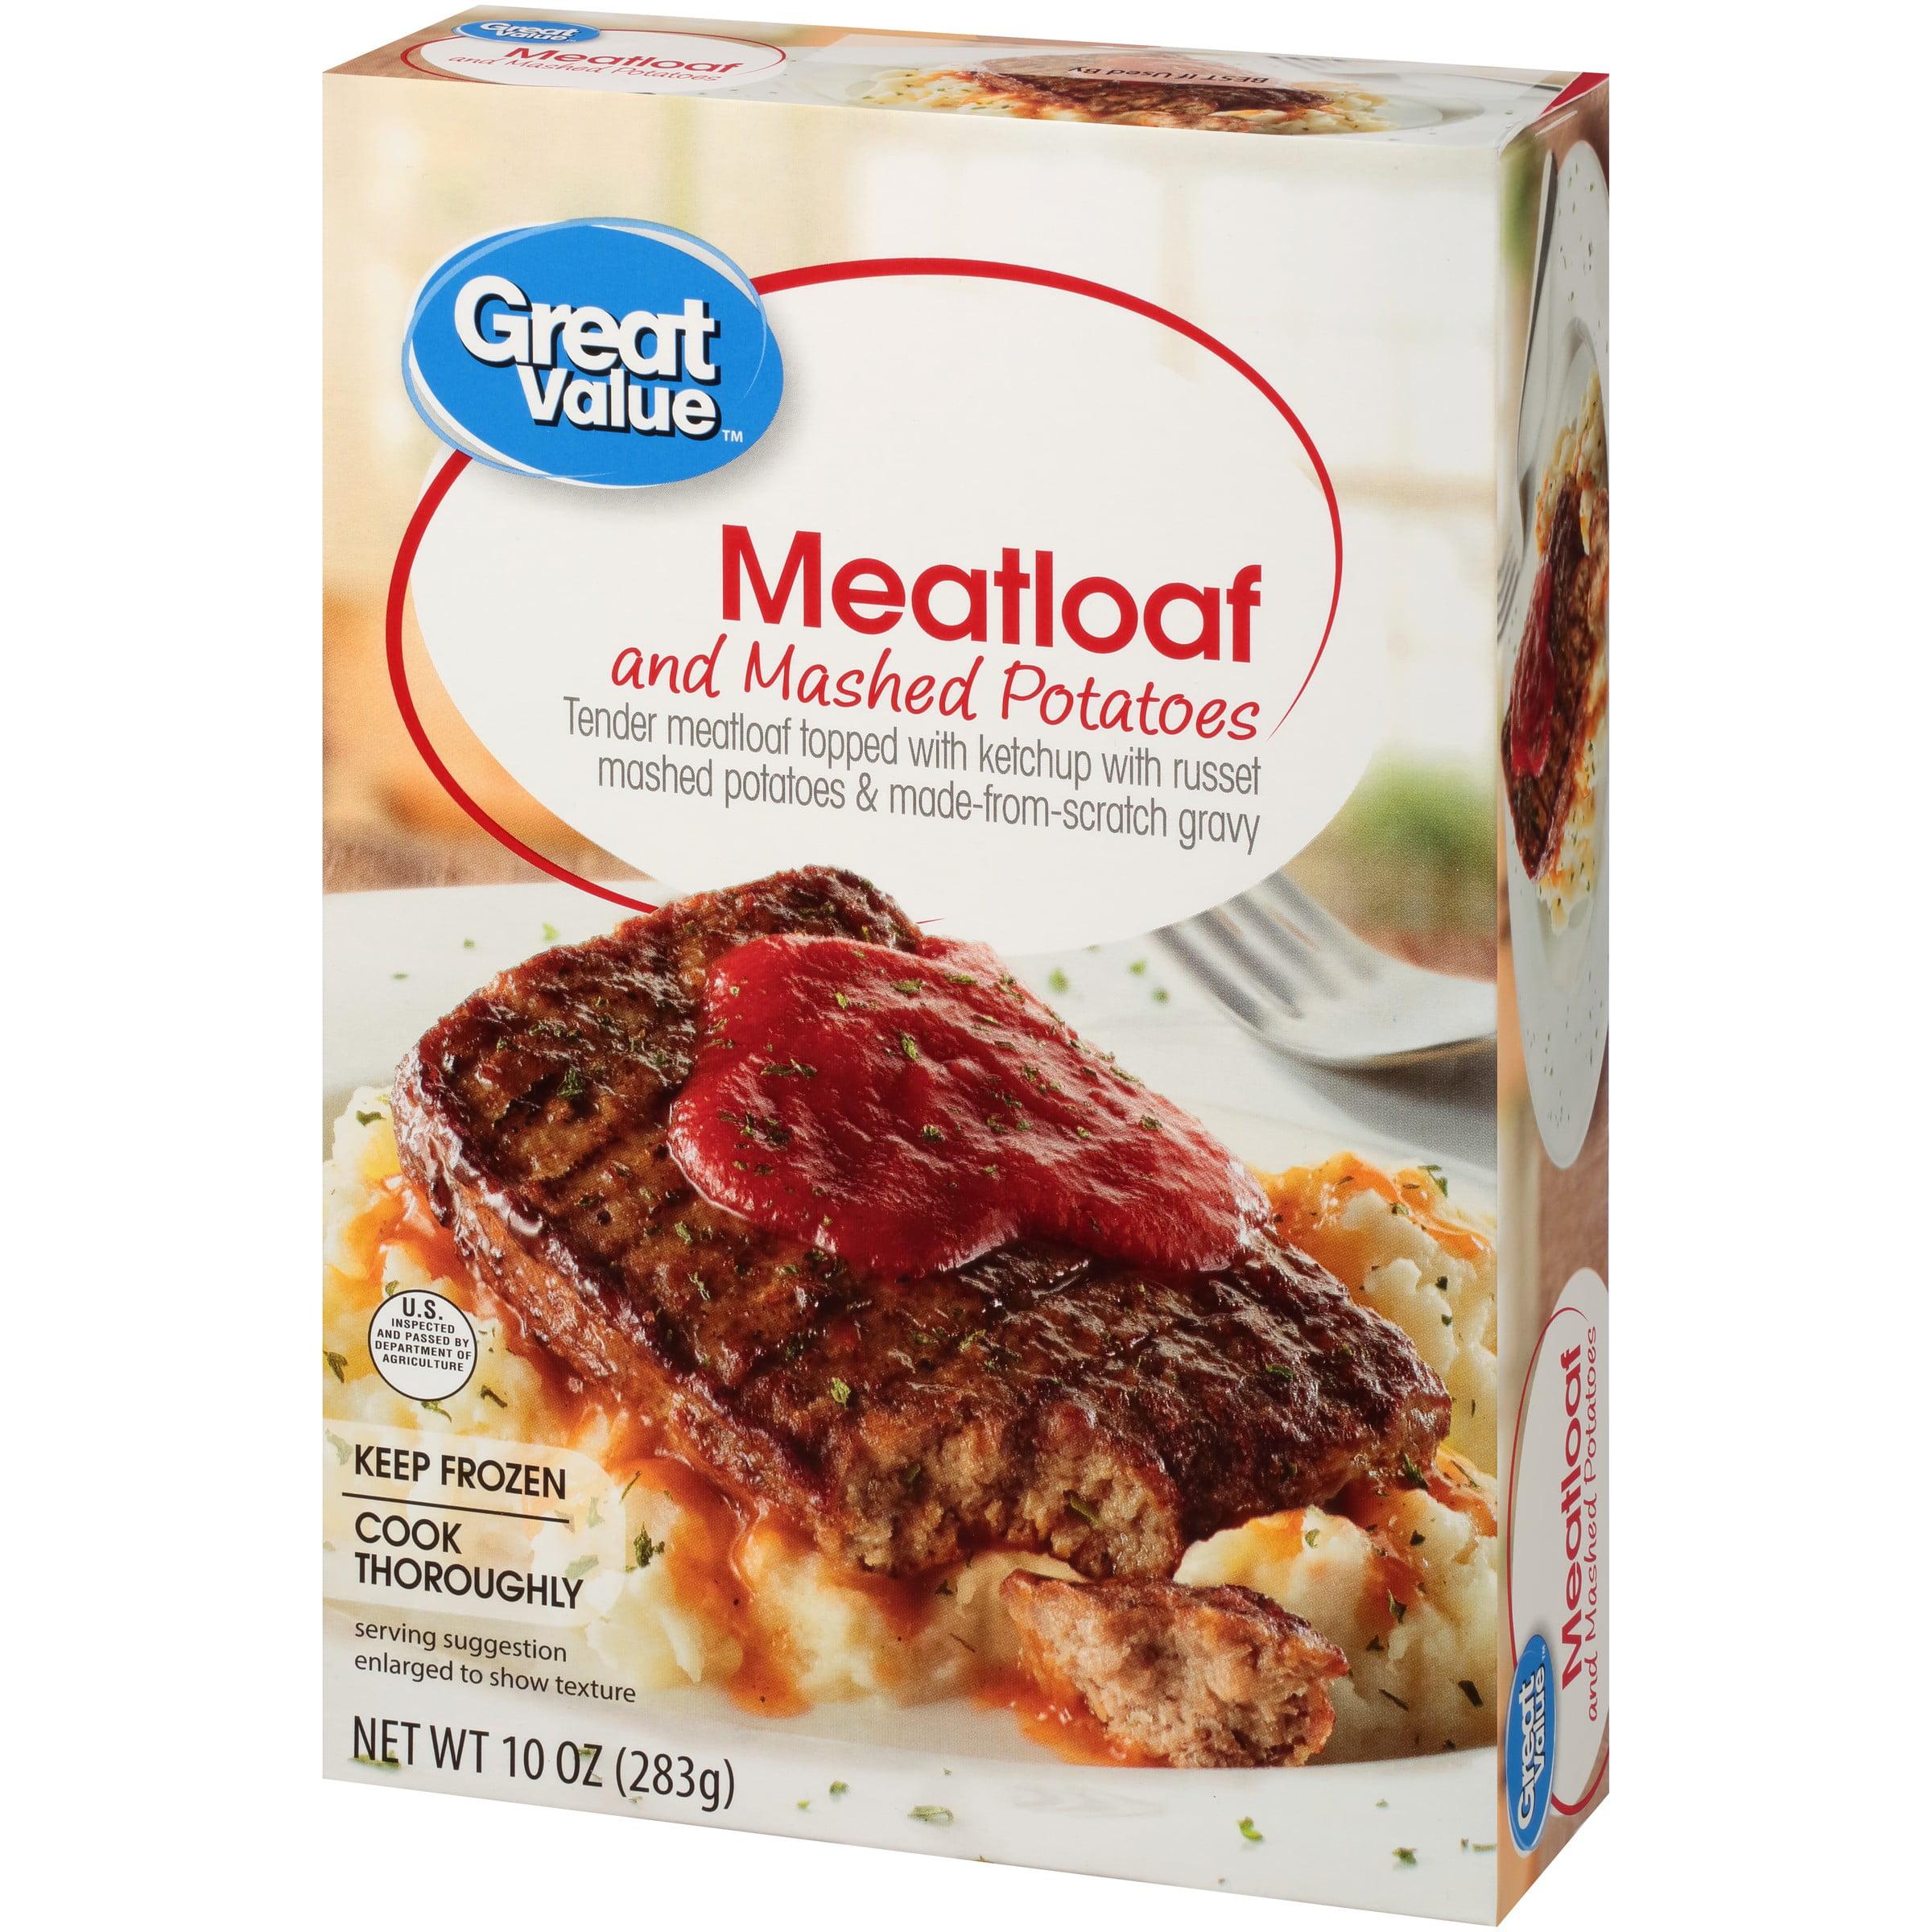 Great Value Meatloaf and Mashed Potatoes, 10 oz - Walmart.com - Walmart.com